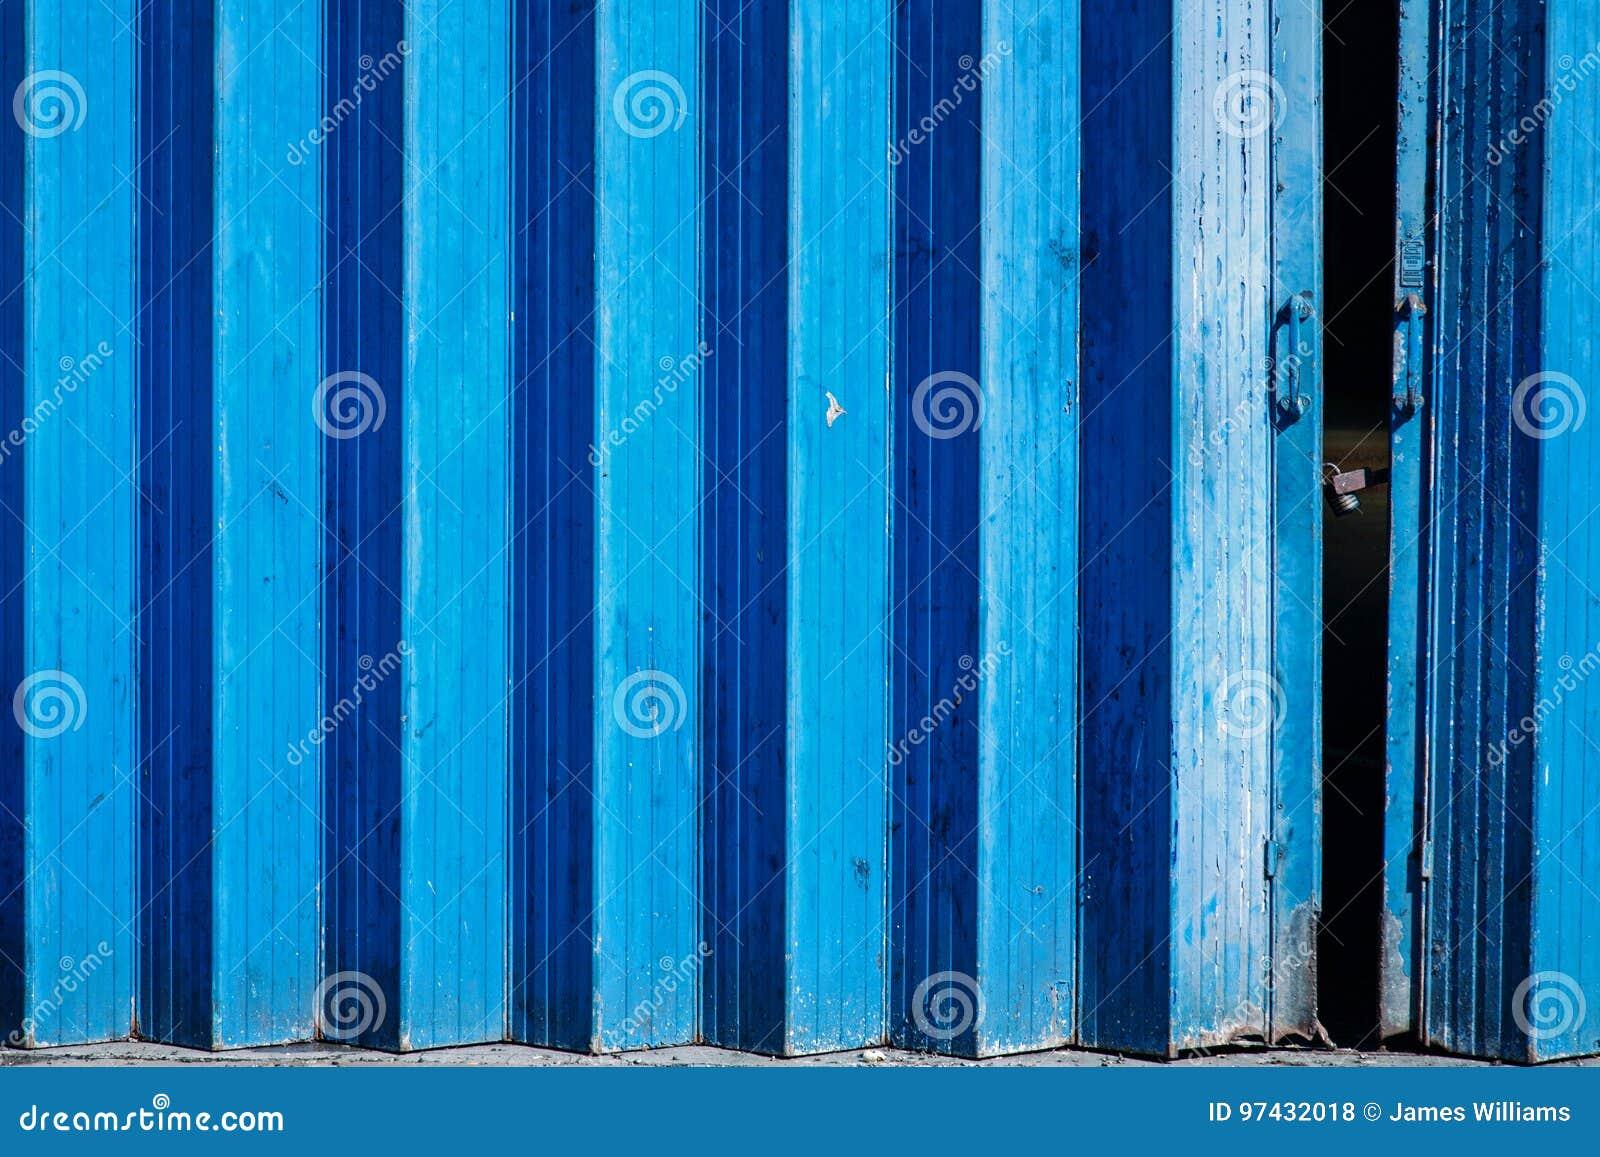 Blue painted concertina gates